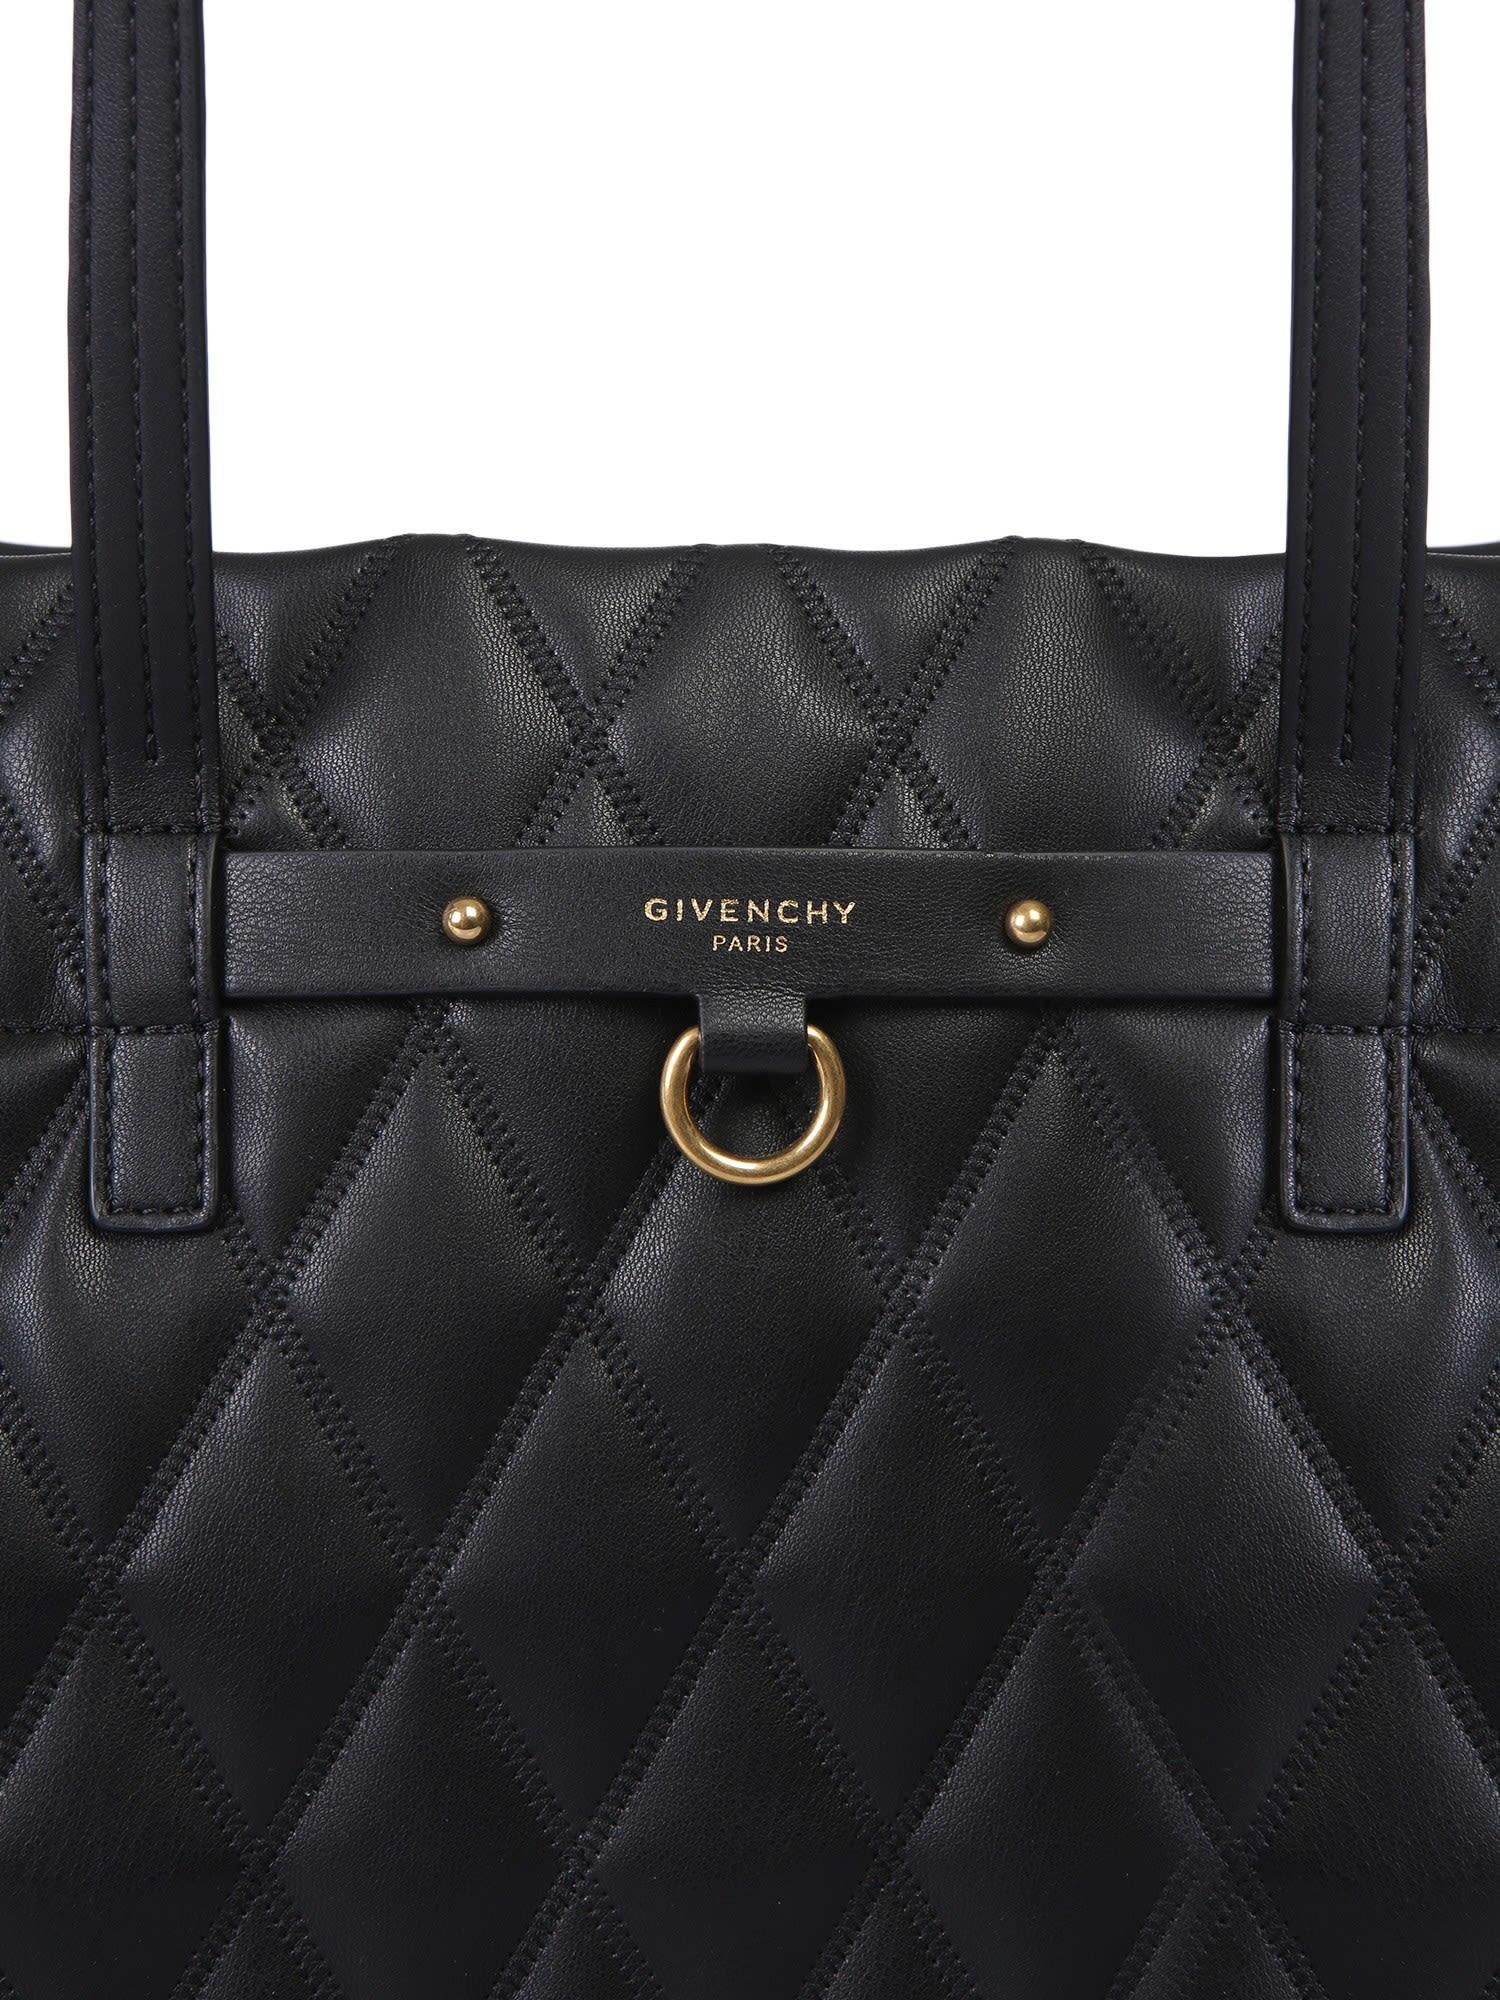 1a0302351f Givenchy Givenchy Duo Tote Bag - NERO - 10792002